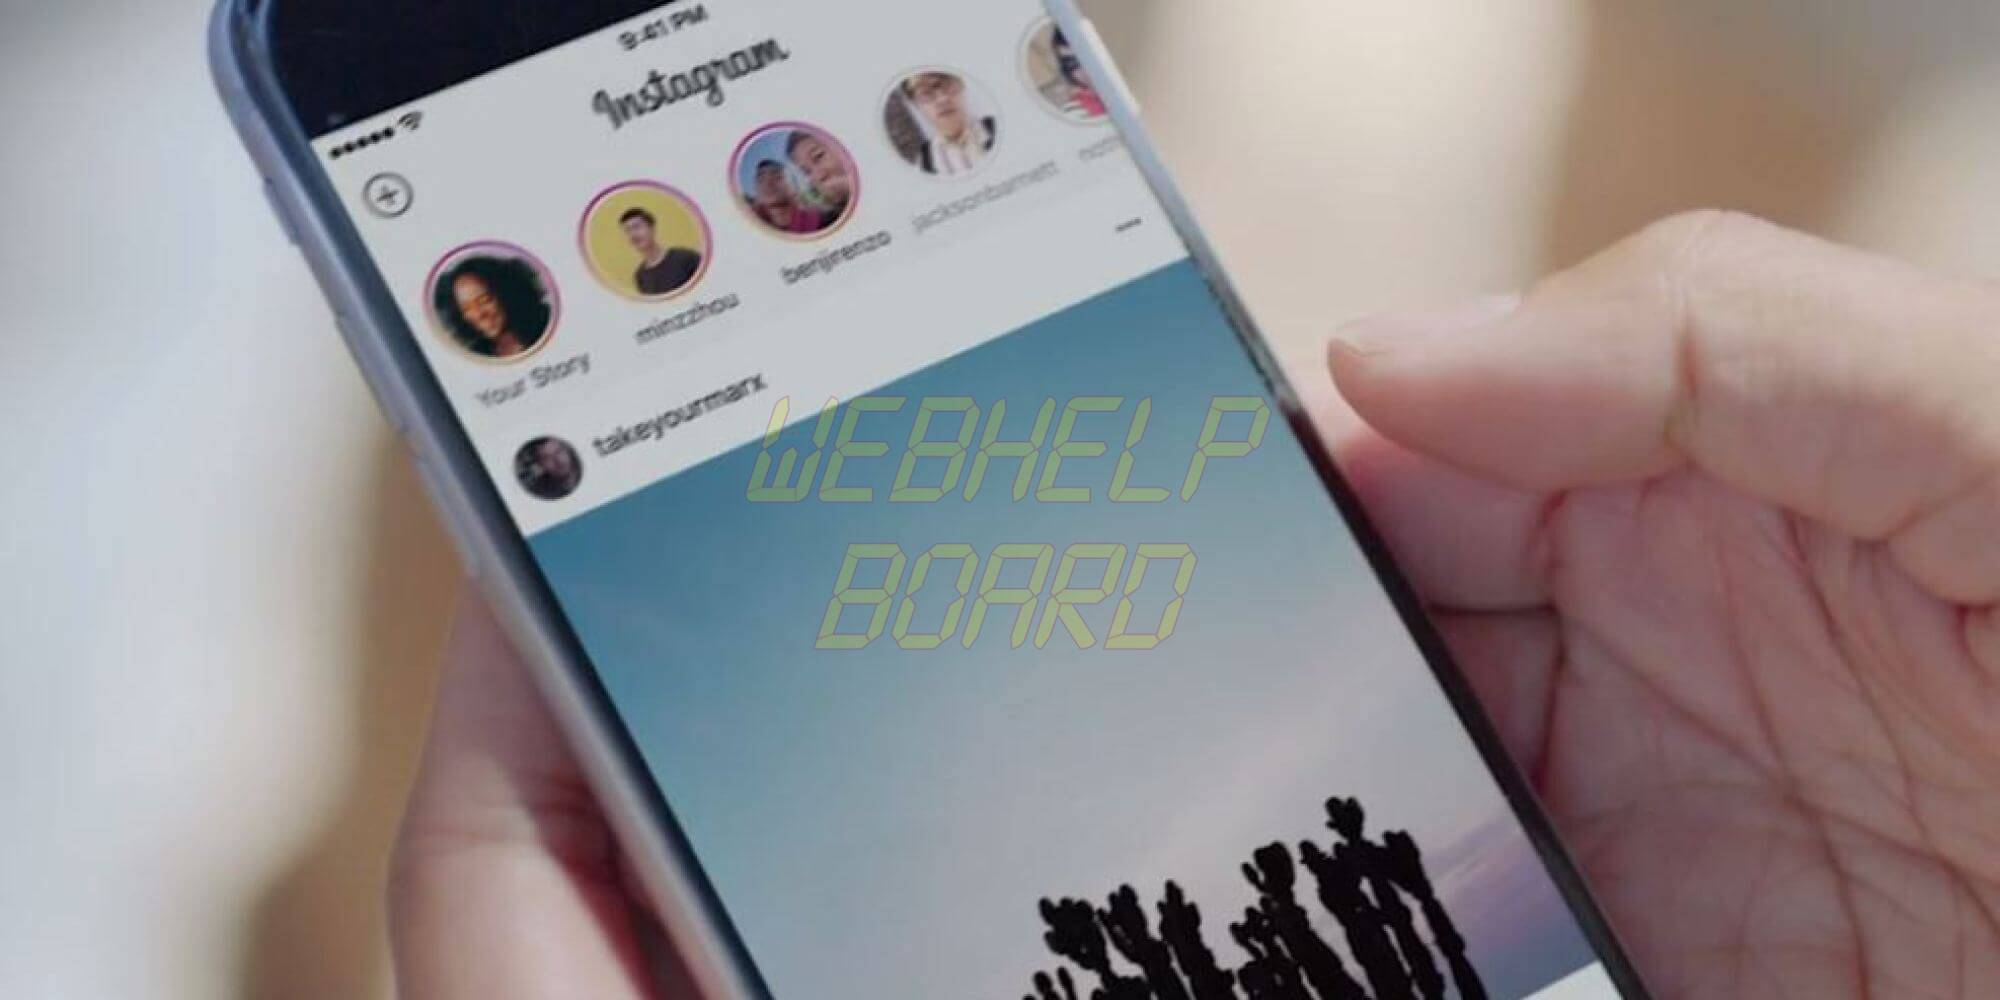 Instagram stories 1 1 - Instagram Stories ataca Snapchat e apresenta Filtros de Rosto